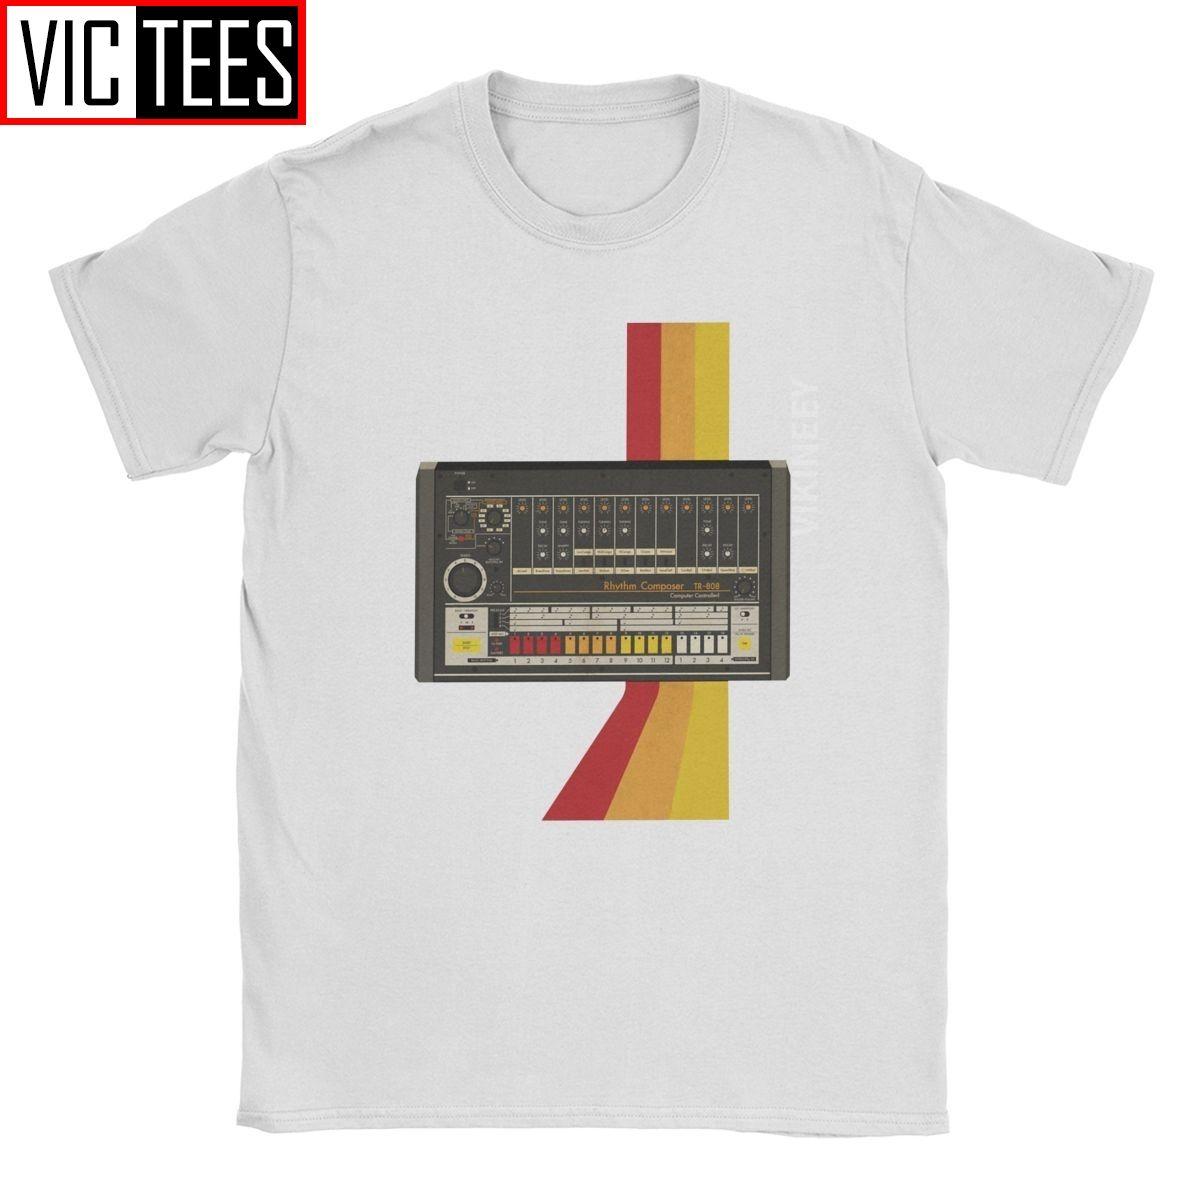 TR-808 Korg Volca camiseta de los hombres sintetizador de música de sintetizador modular Electro Techno 100 por ciento de algodón de cuello redondo Camiseta